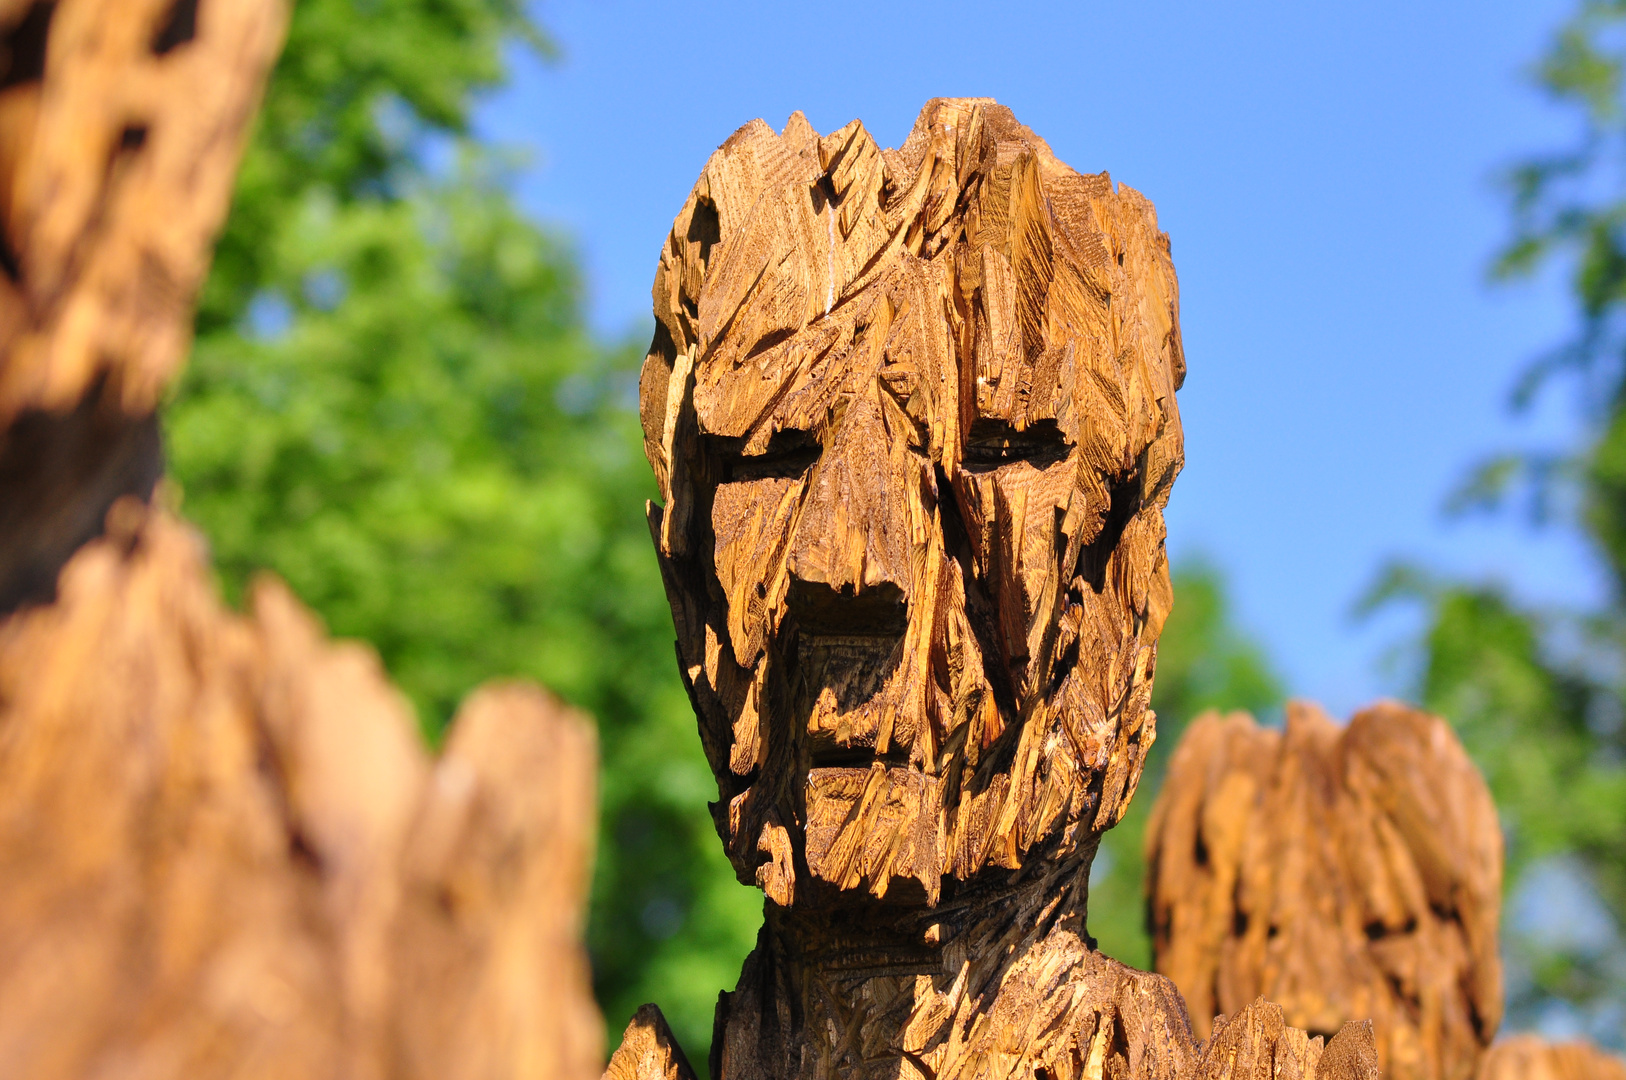 Holzkopf Foto & Bild | abstraktes, formen, holz Bilder auf